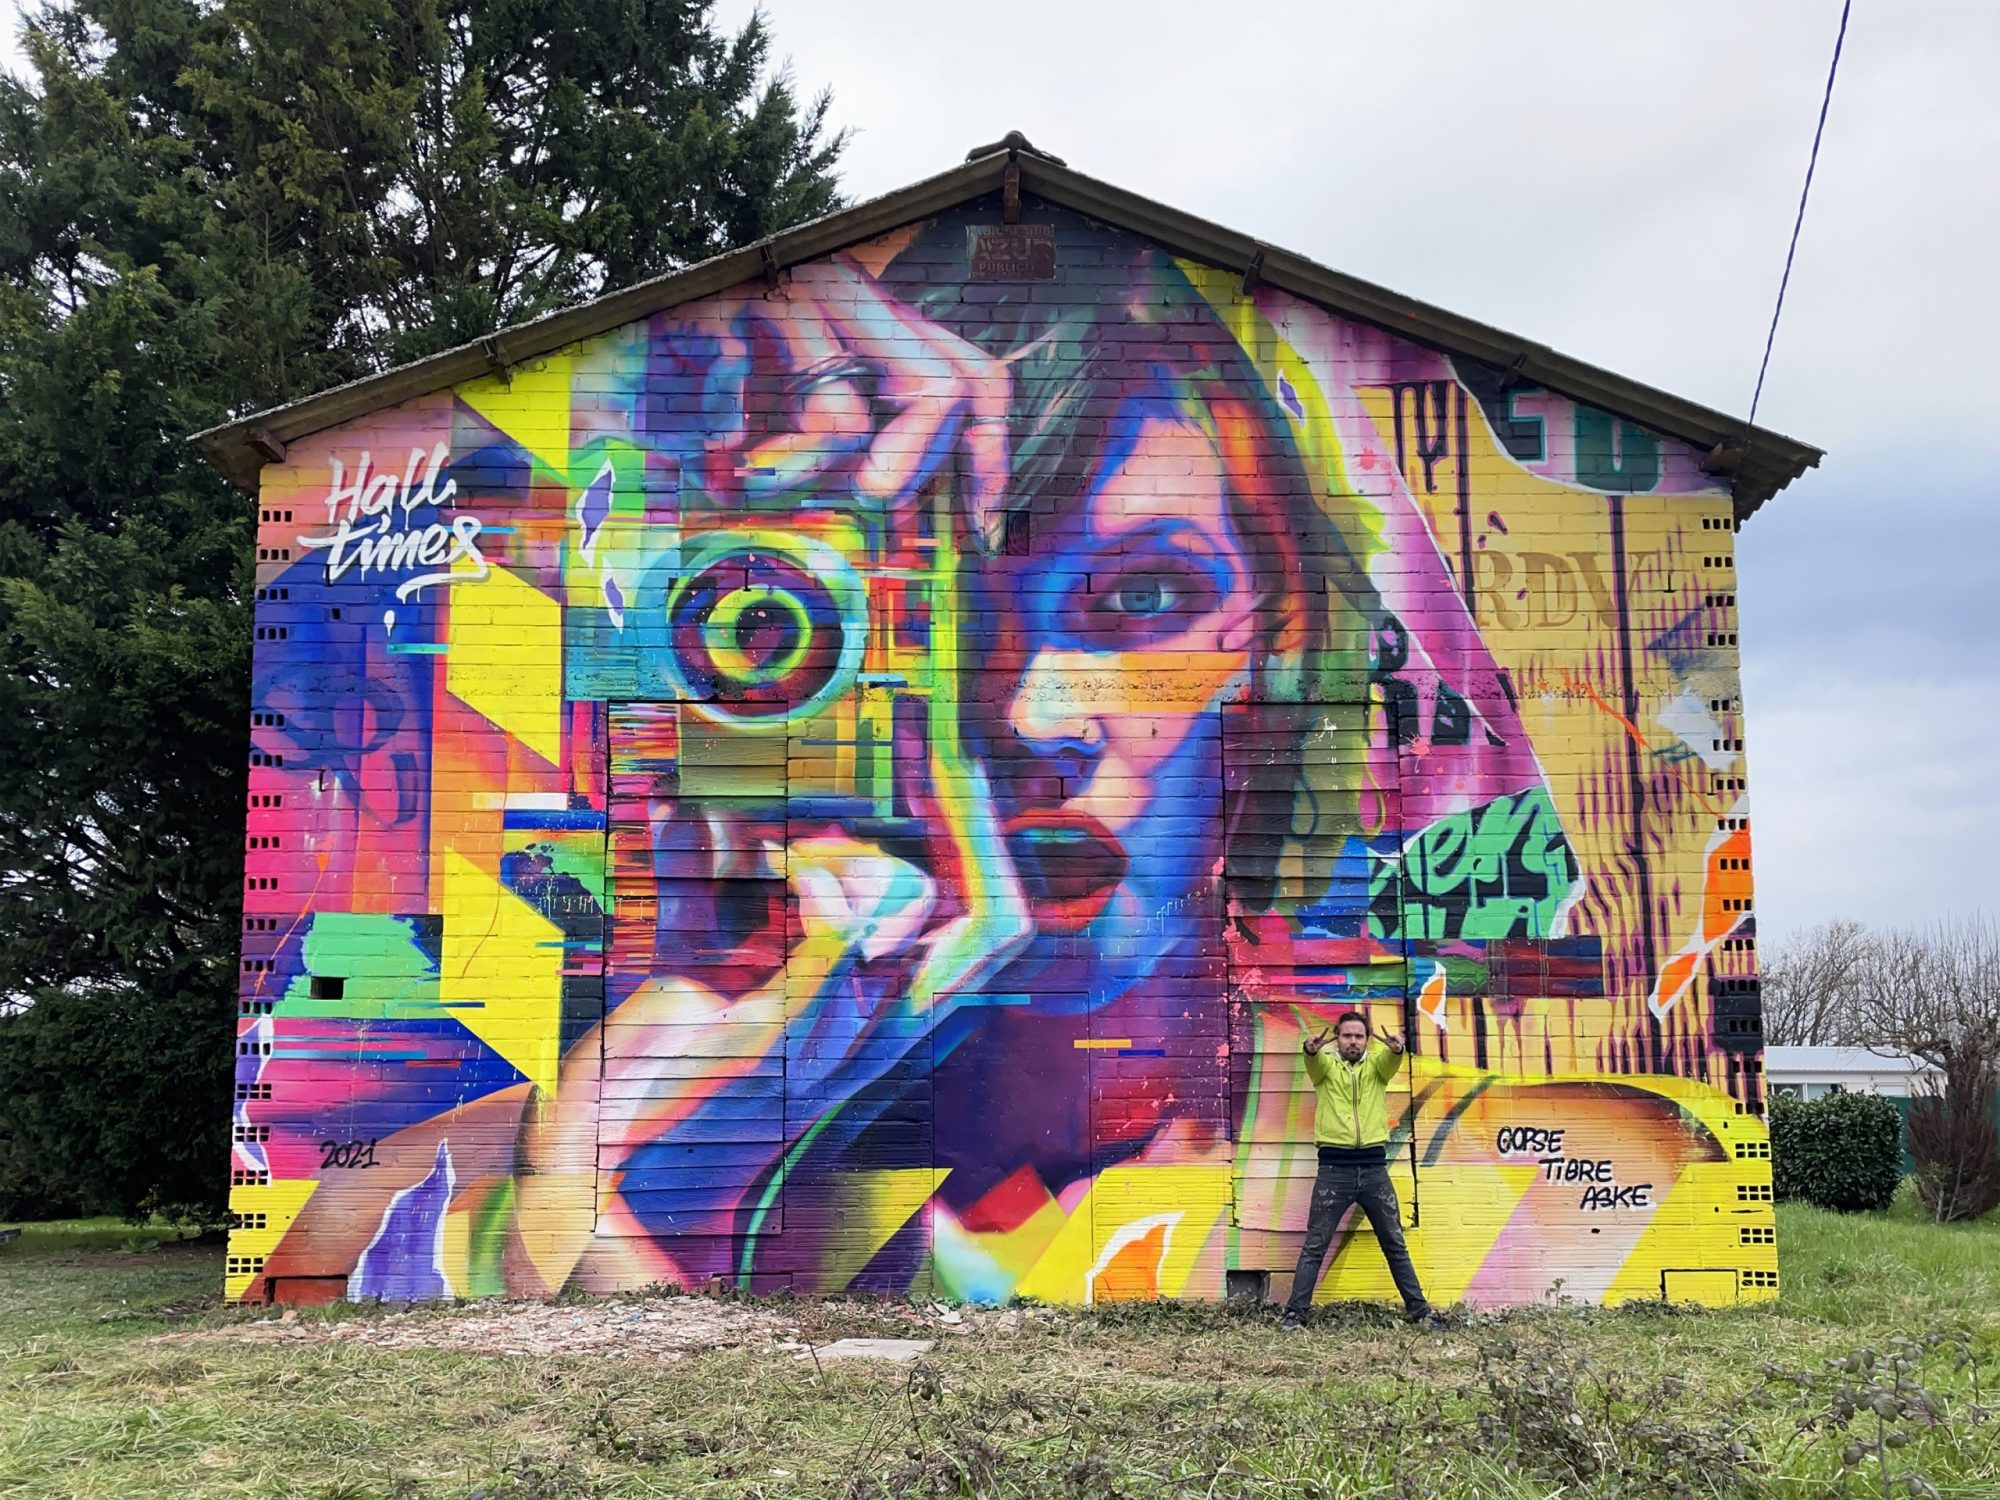 fresque-graffiti-halltimes-toulouse-montauban